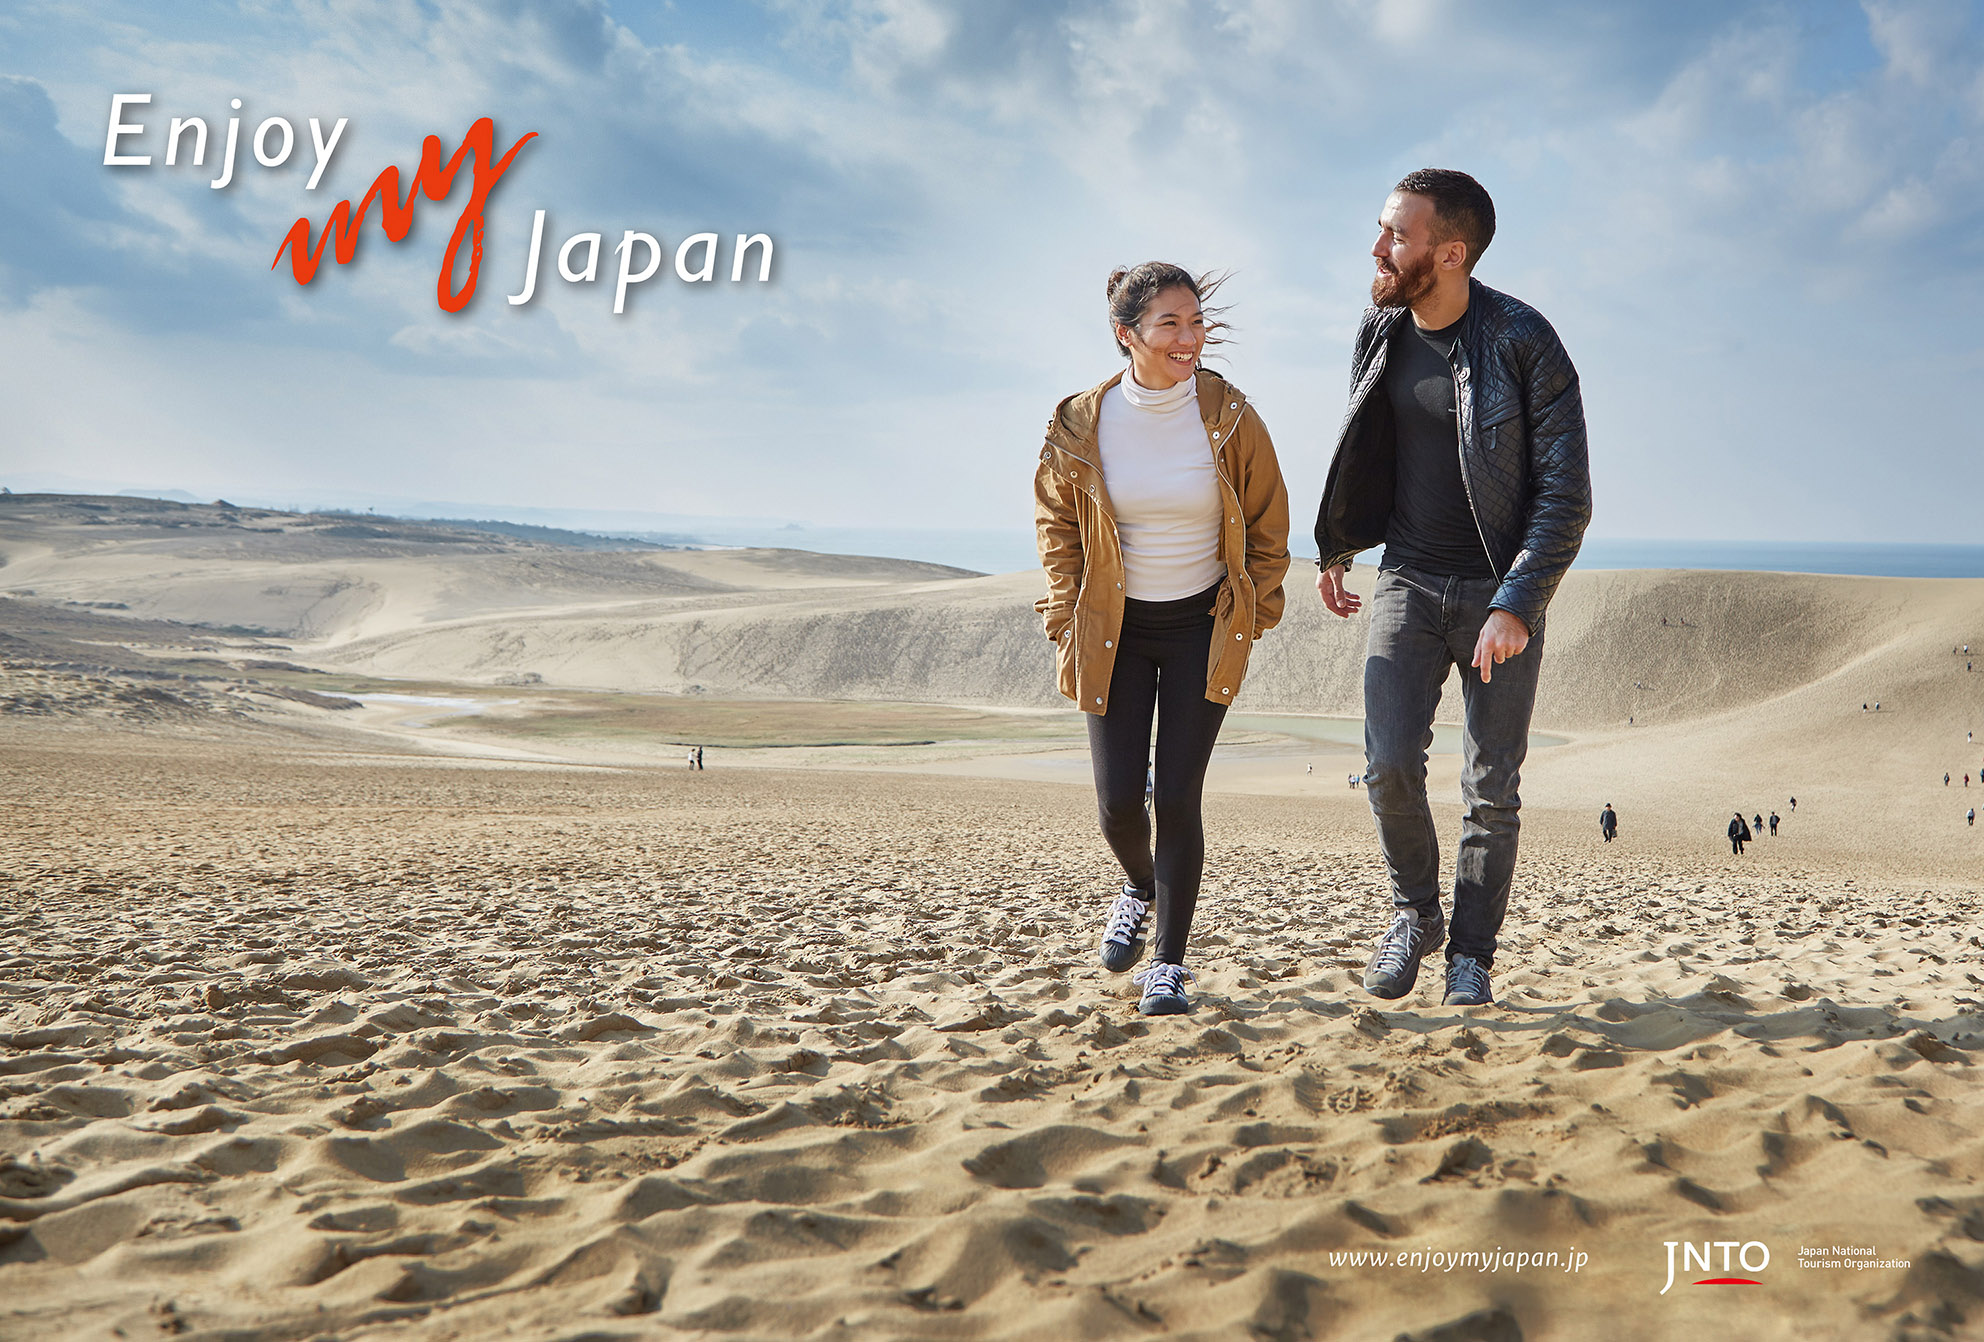 Enjoy My Japan - Global Ad Campaign